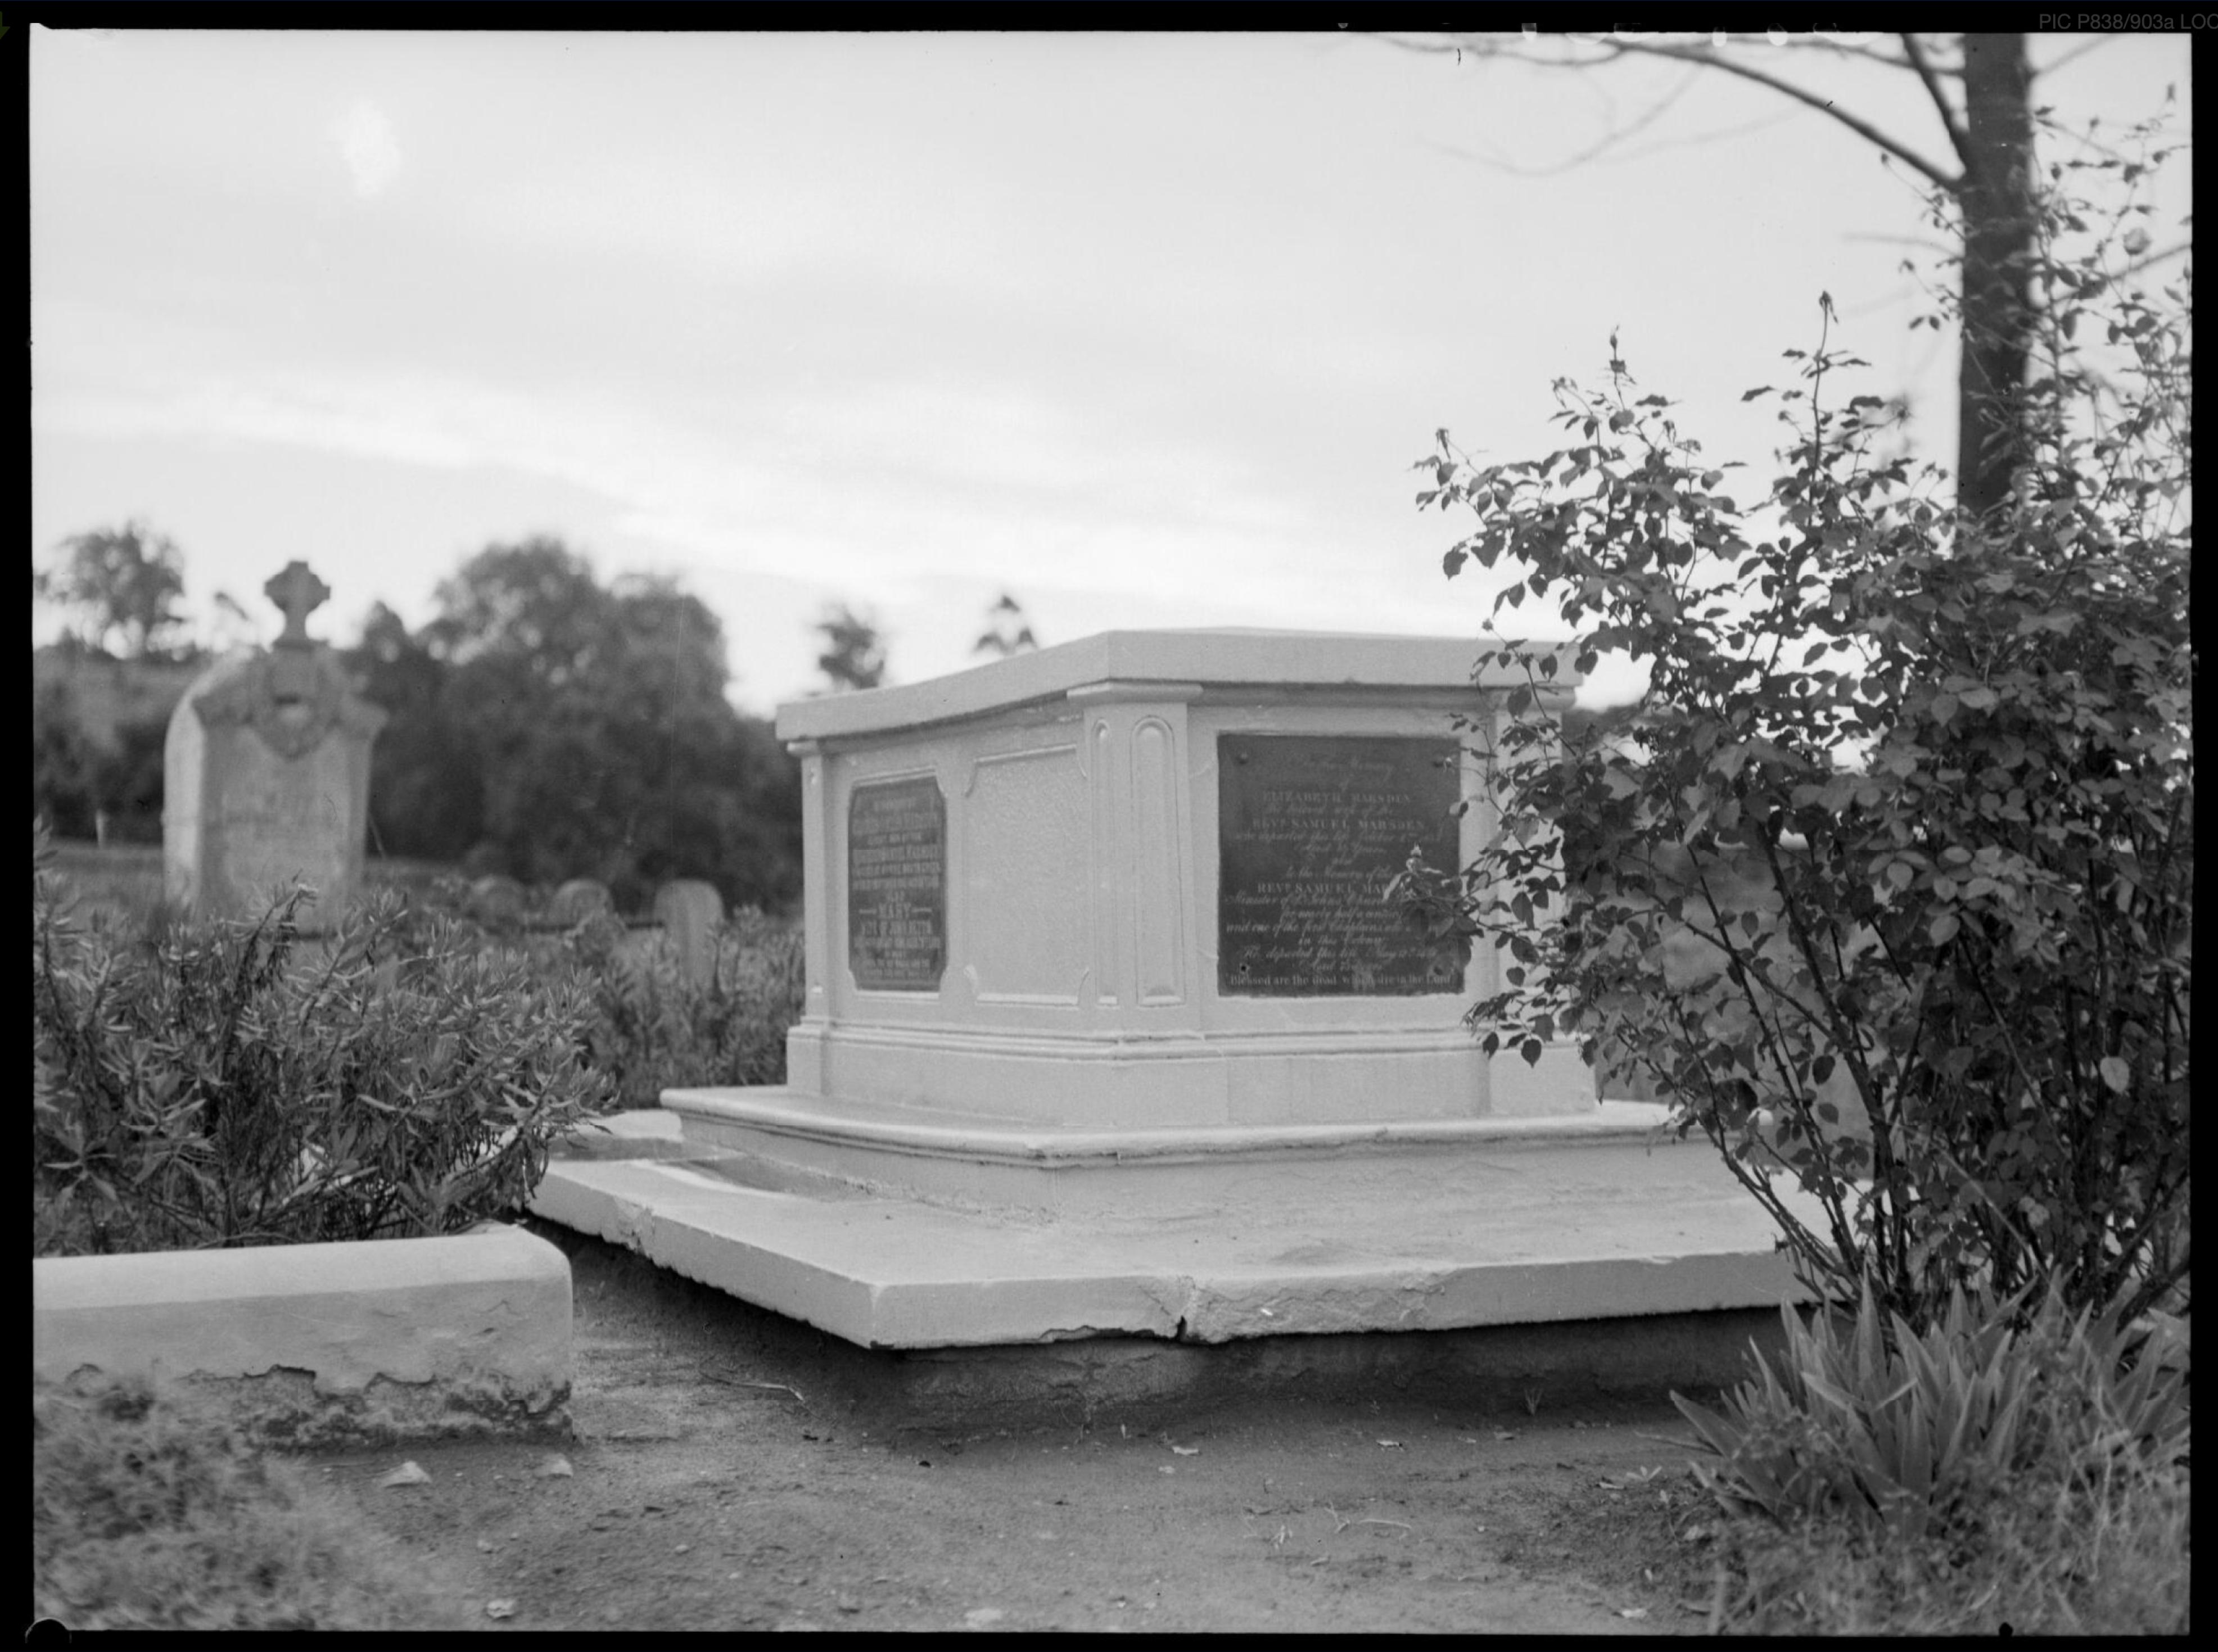 Reverend Samuel Marsden, grave, St. John's Cemetery, Parramatta, The Flogging Parson, Matthew Allen, Myth of the Flogging Parson, St. John's Cemetery Project, Old Parramattans